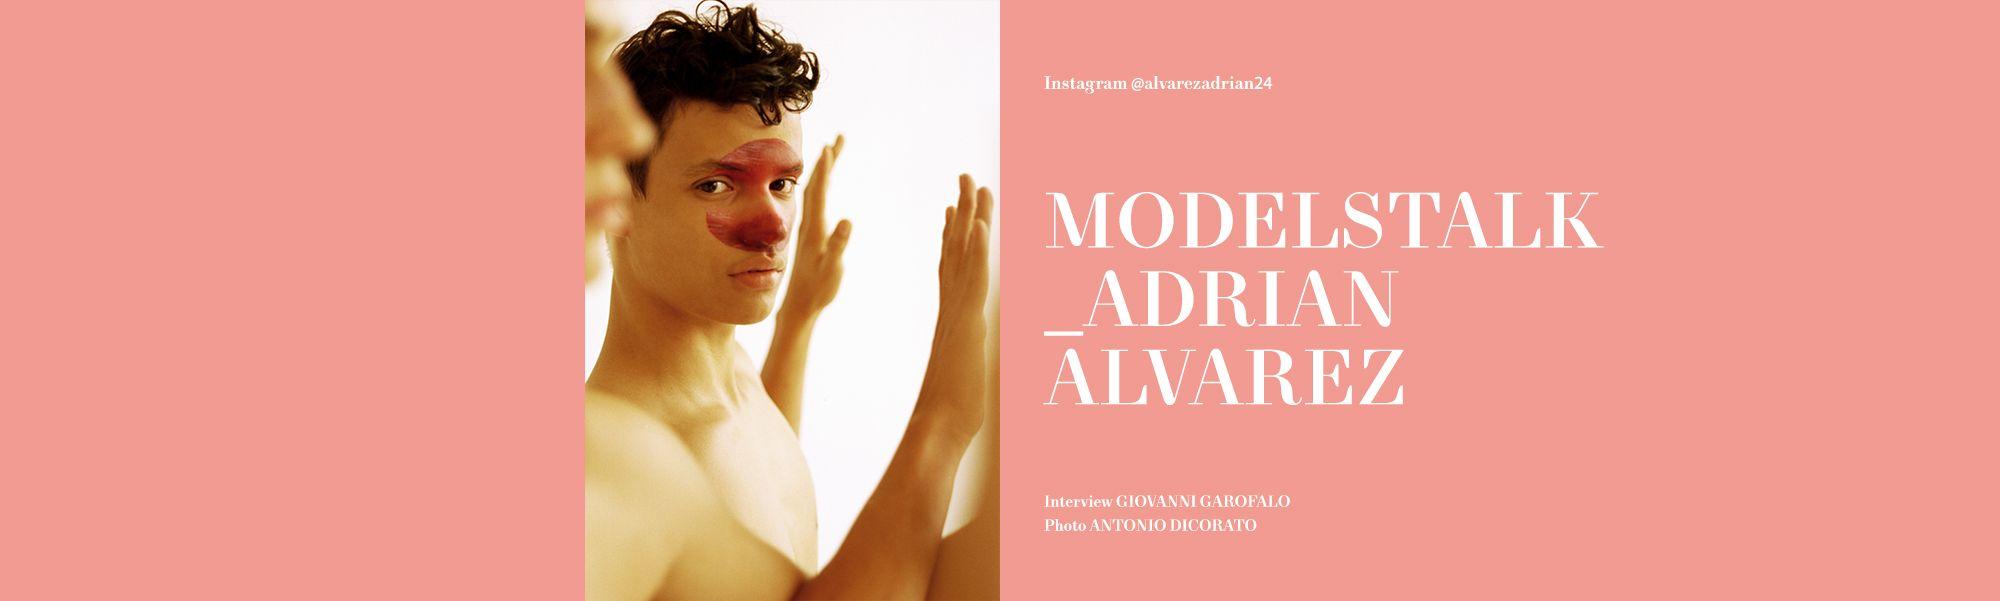 adrian-alvarez-thegreatestmagazine-banner